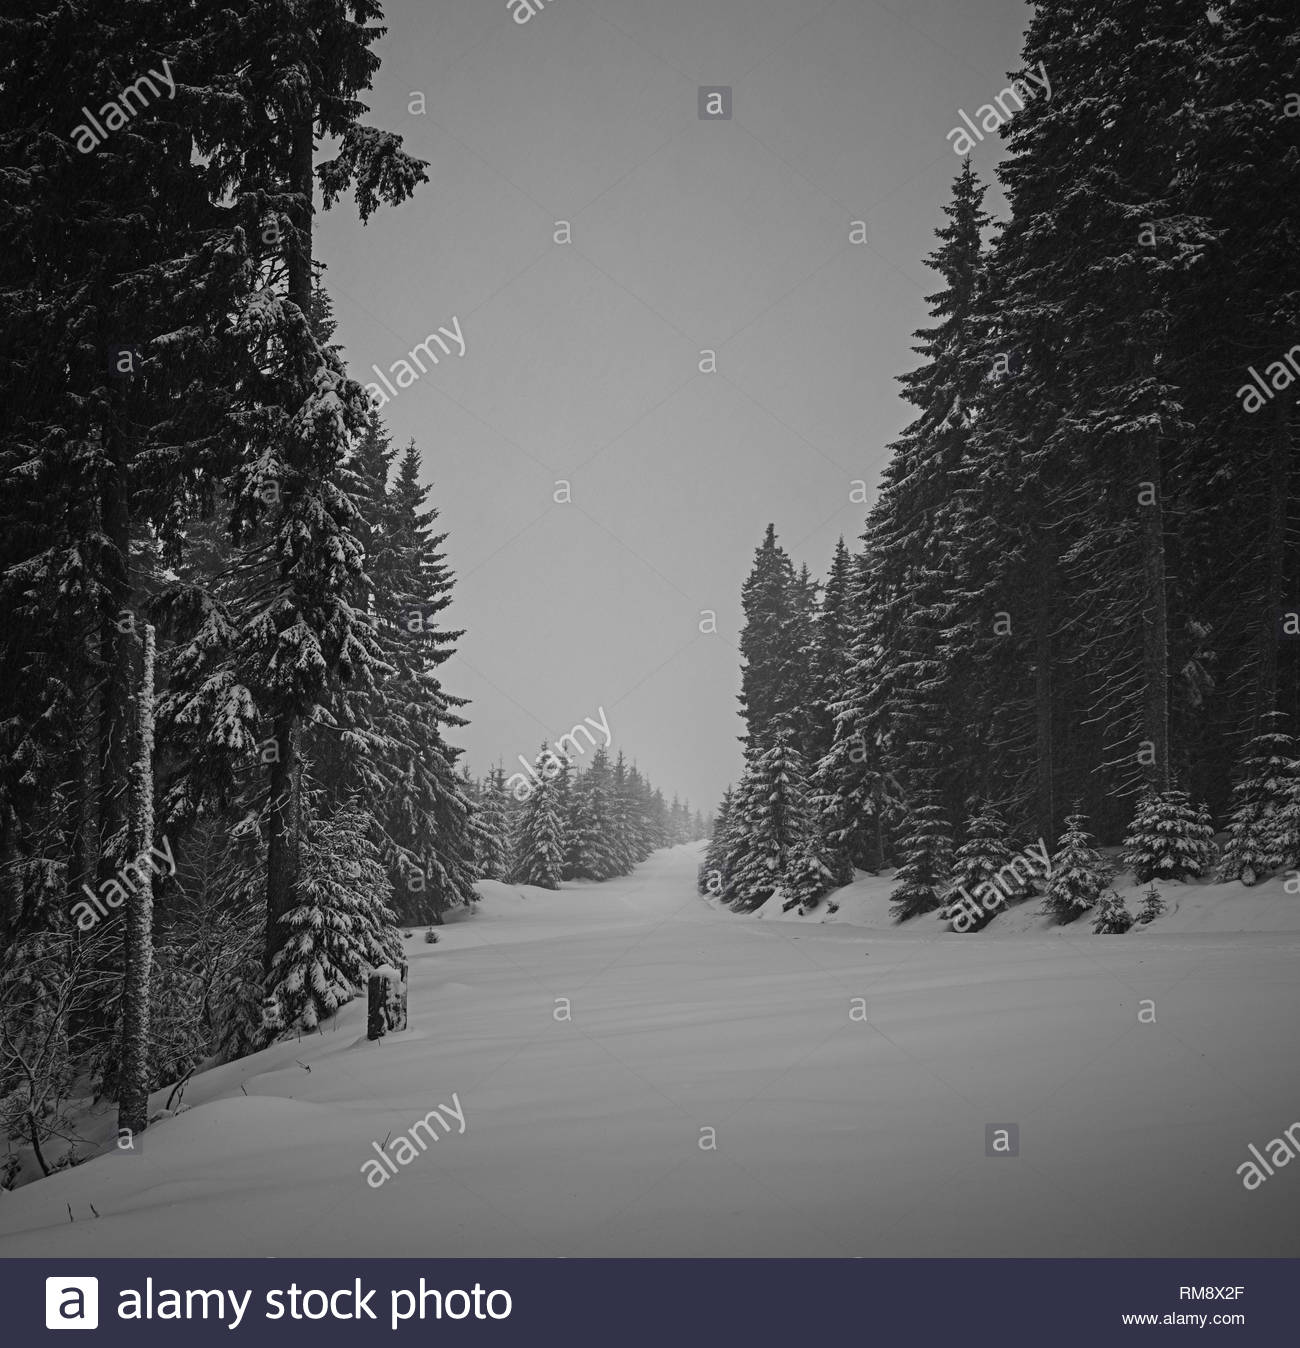 snowy woods - Stock Image